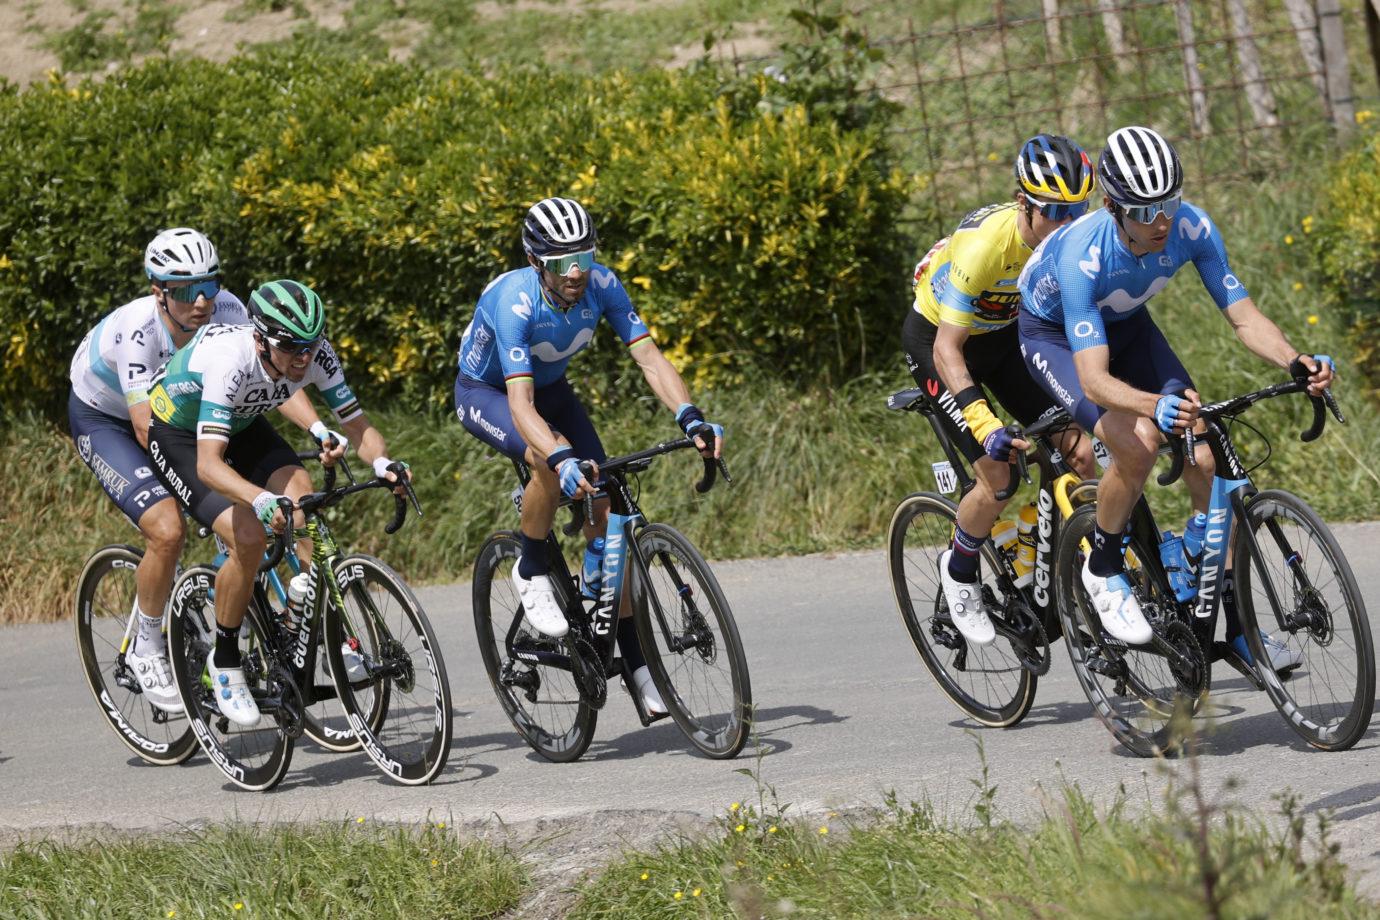 Imagen de la noticia 'Itzulia again wide open after Erlaitz climb; Valverde now 8th overall'